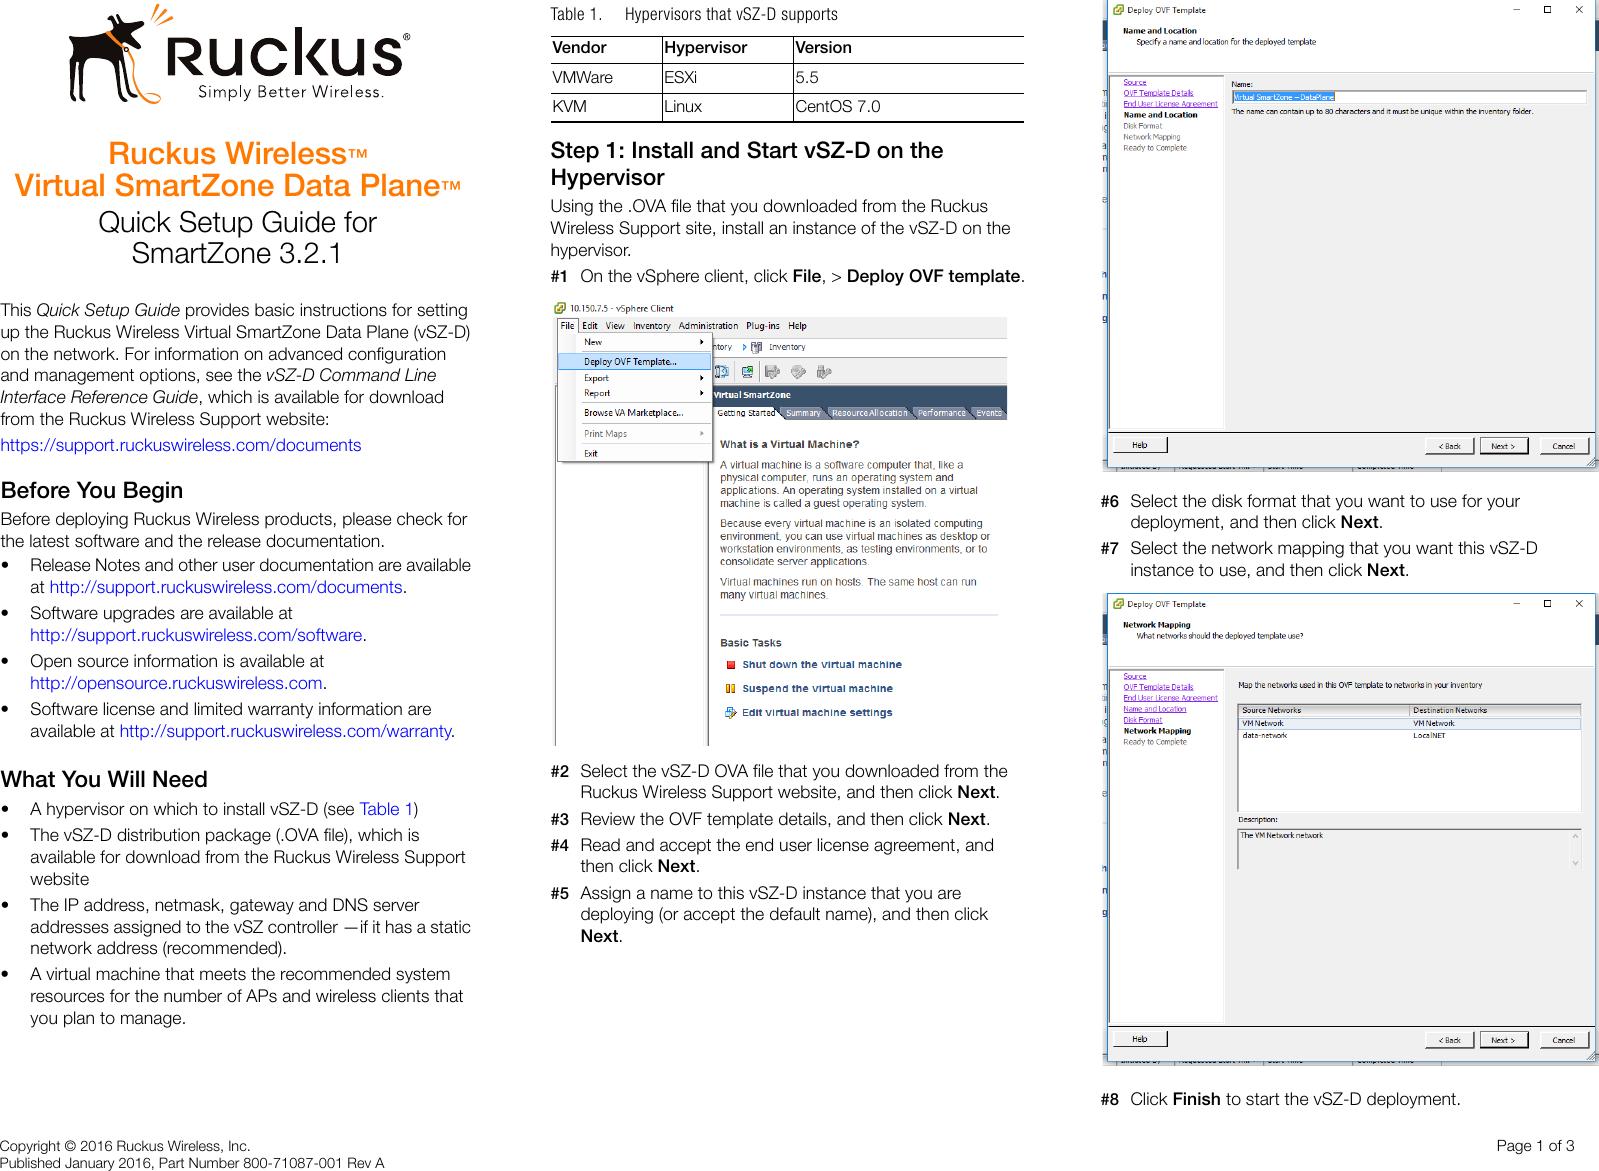 Ruckus Virtual SmartZone Data Plane (vSZ D™) Quick Setup